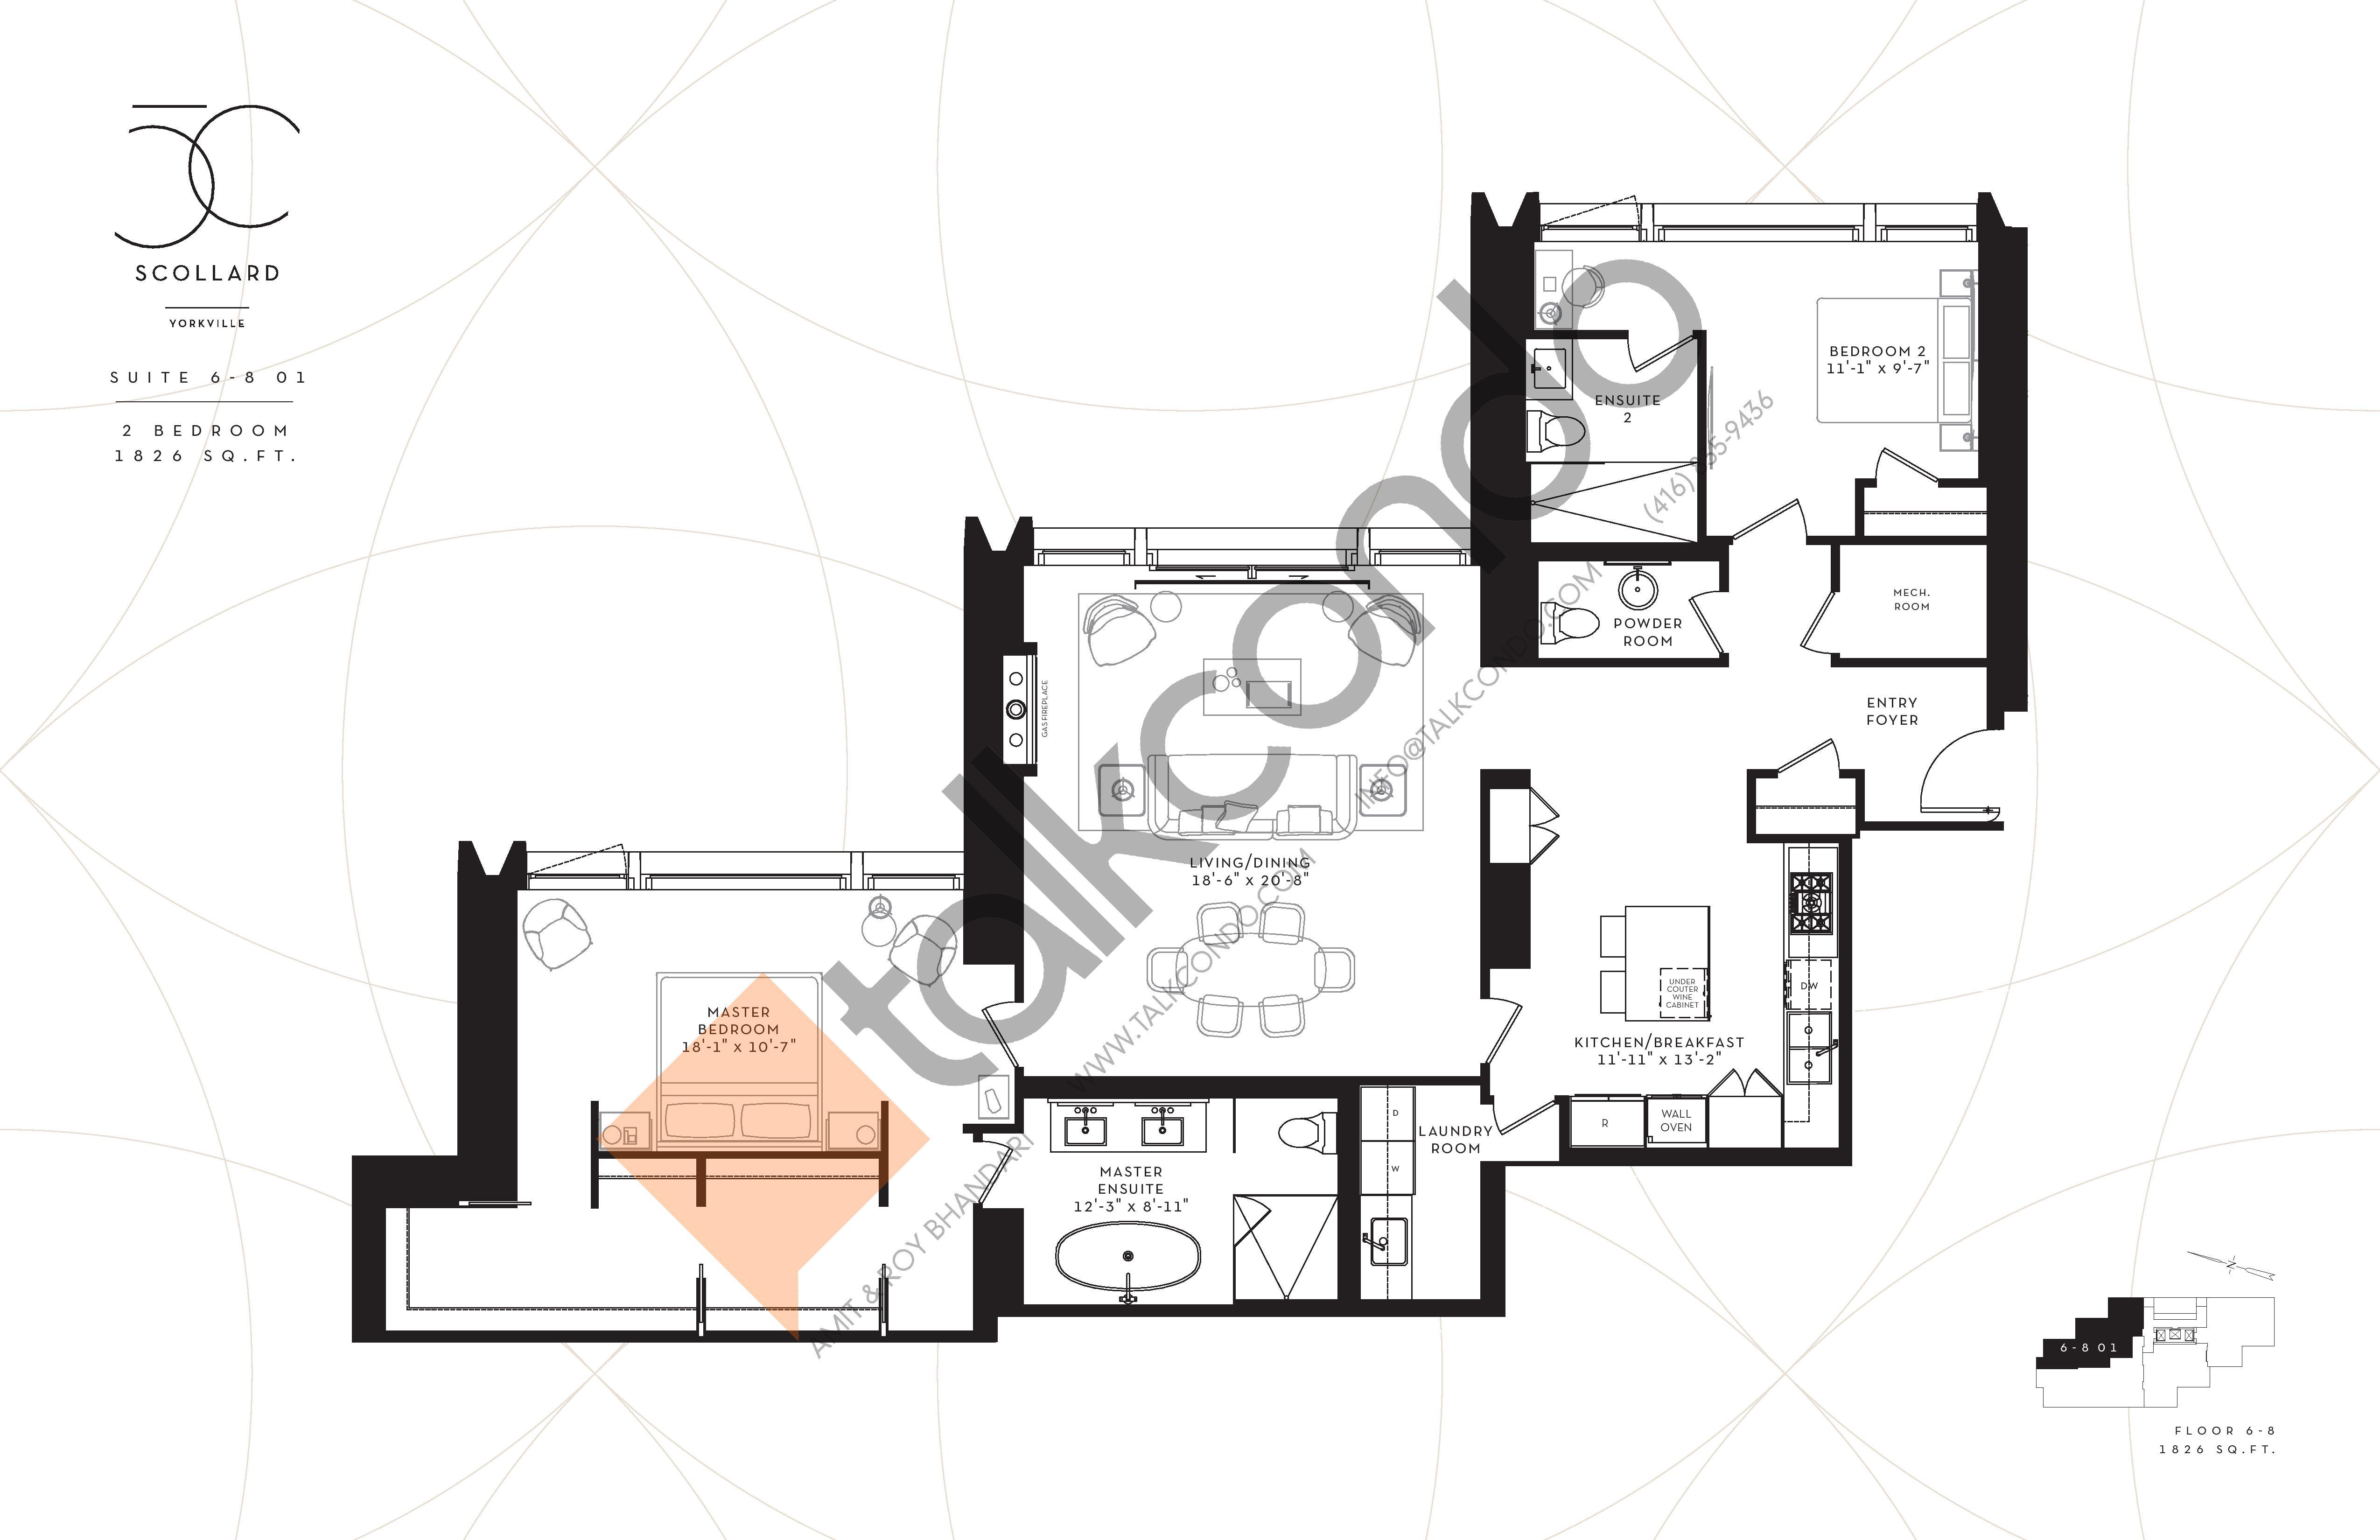 Suite 6-8 01 Floor Plan at Fifty Scollard Condos - 1826 sq.ft